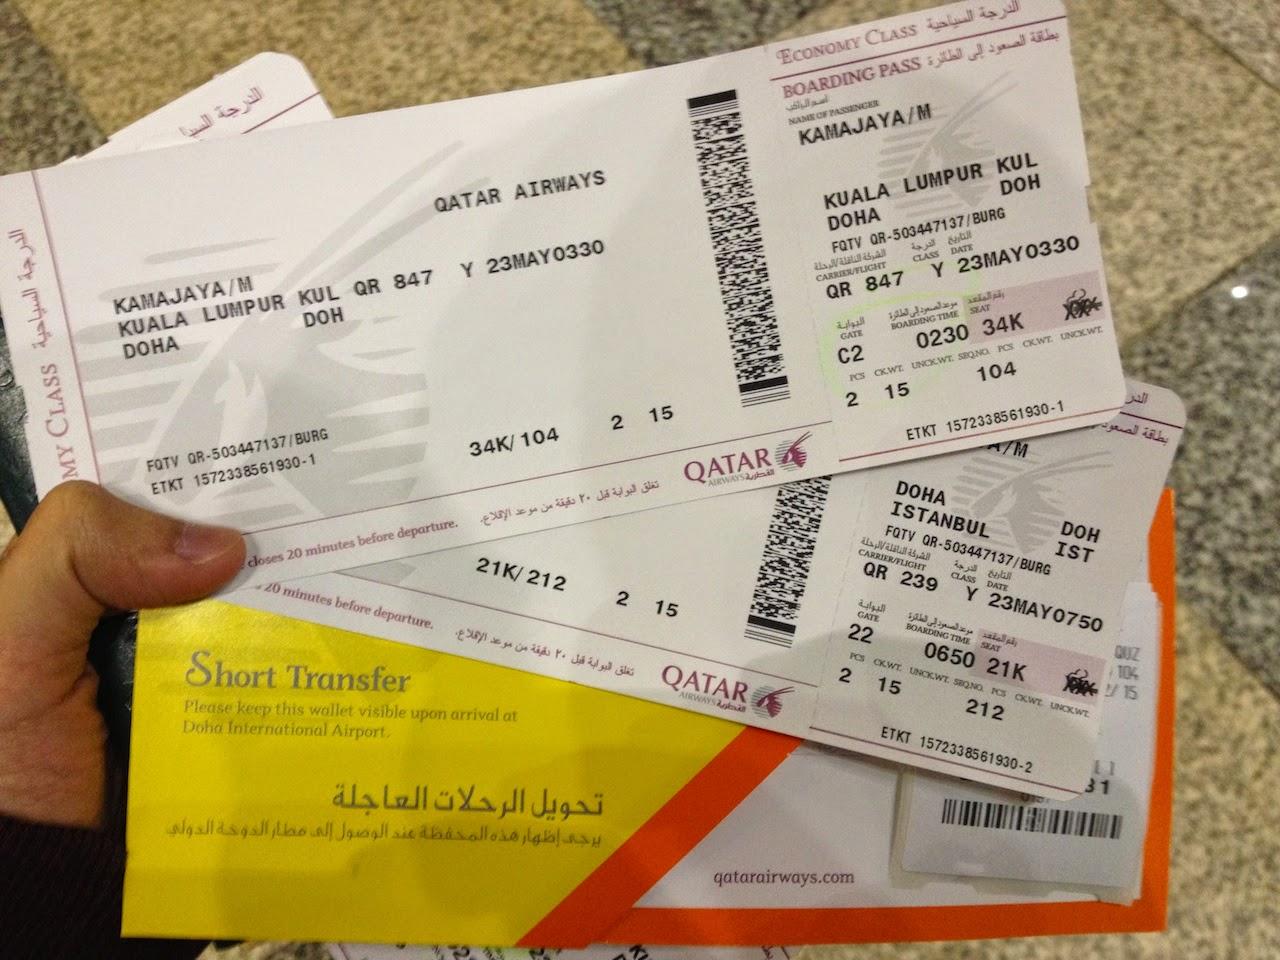 Terbang Dengan Qatar Airways The Story Of My Life